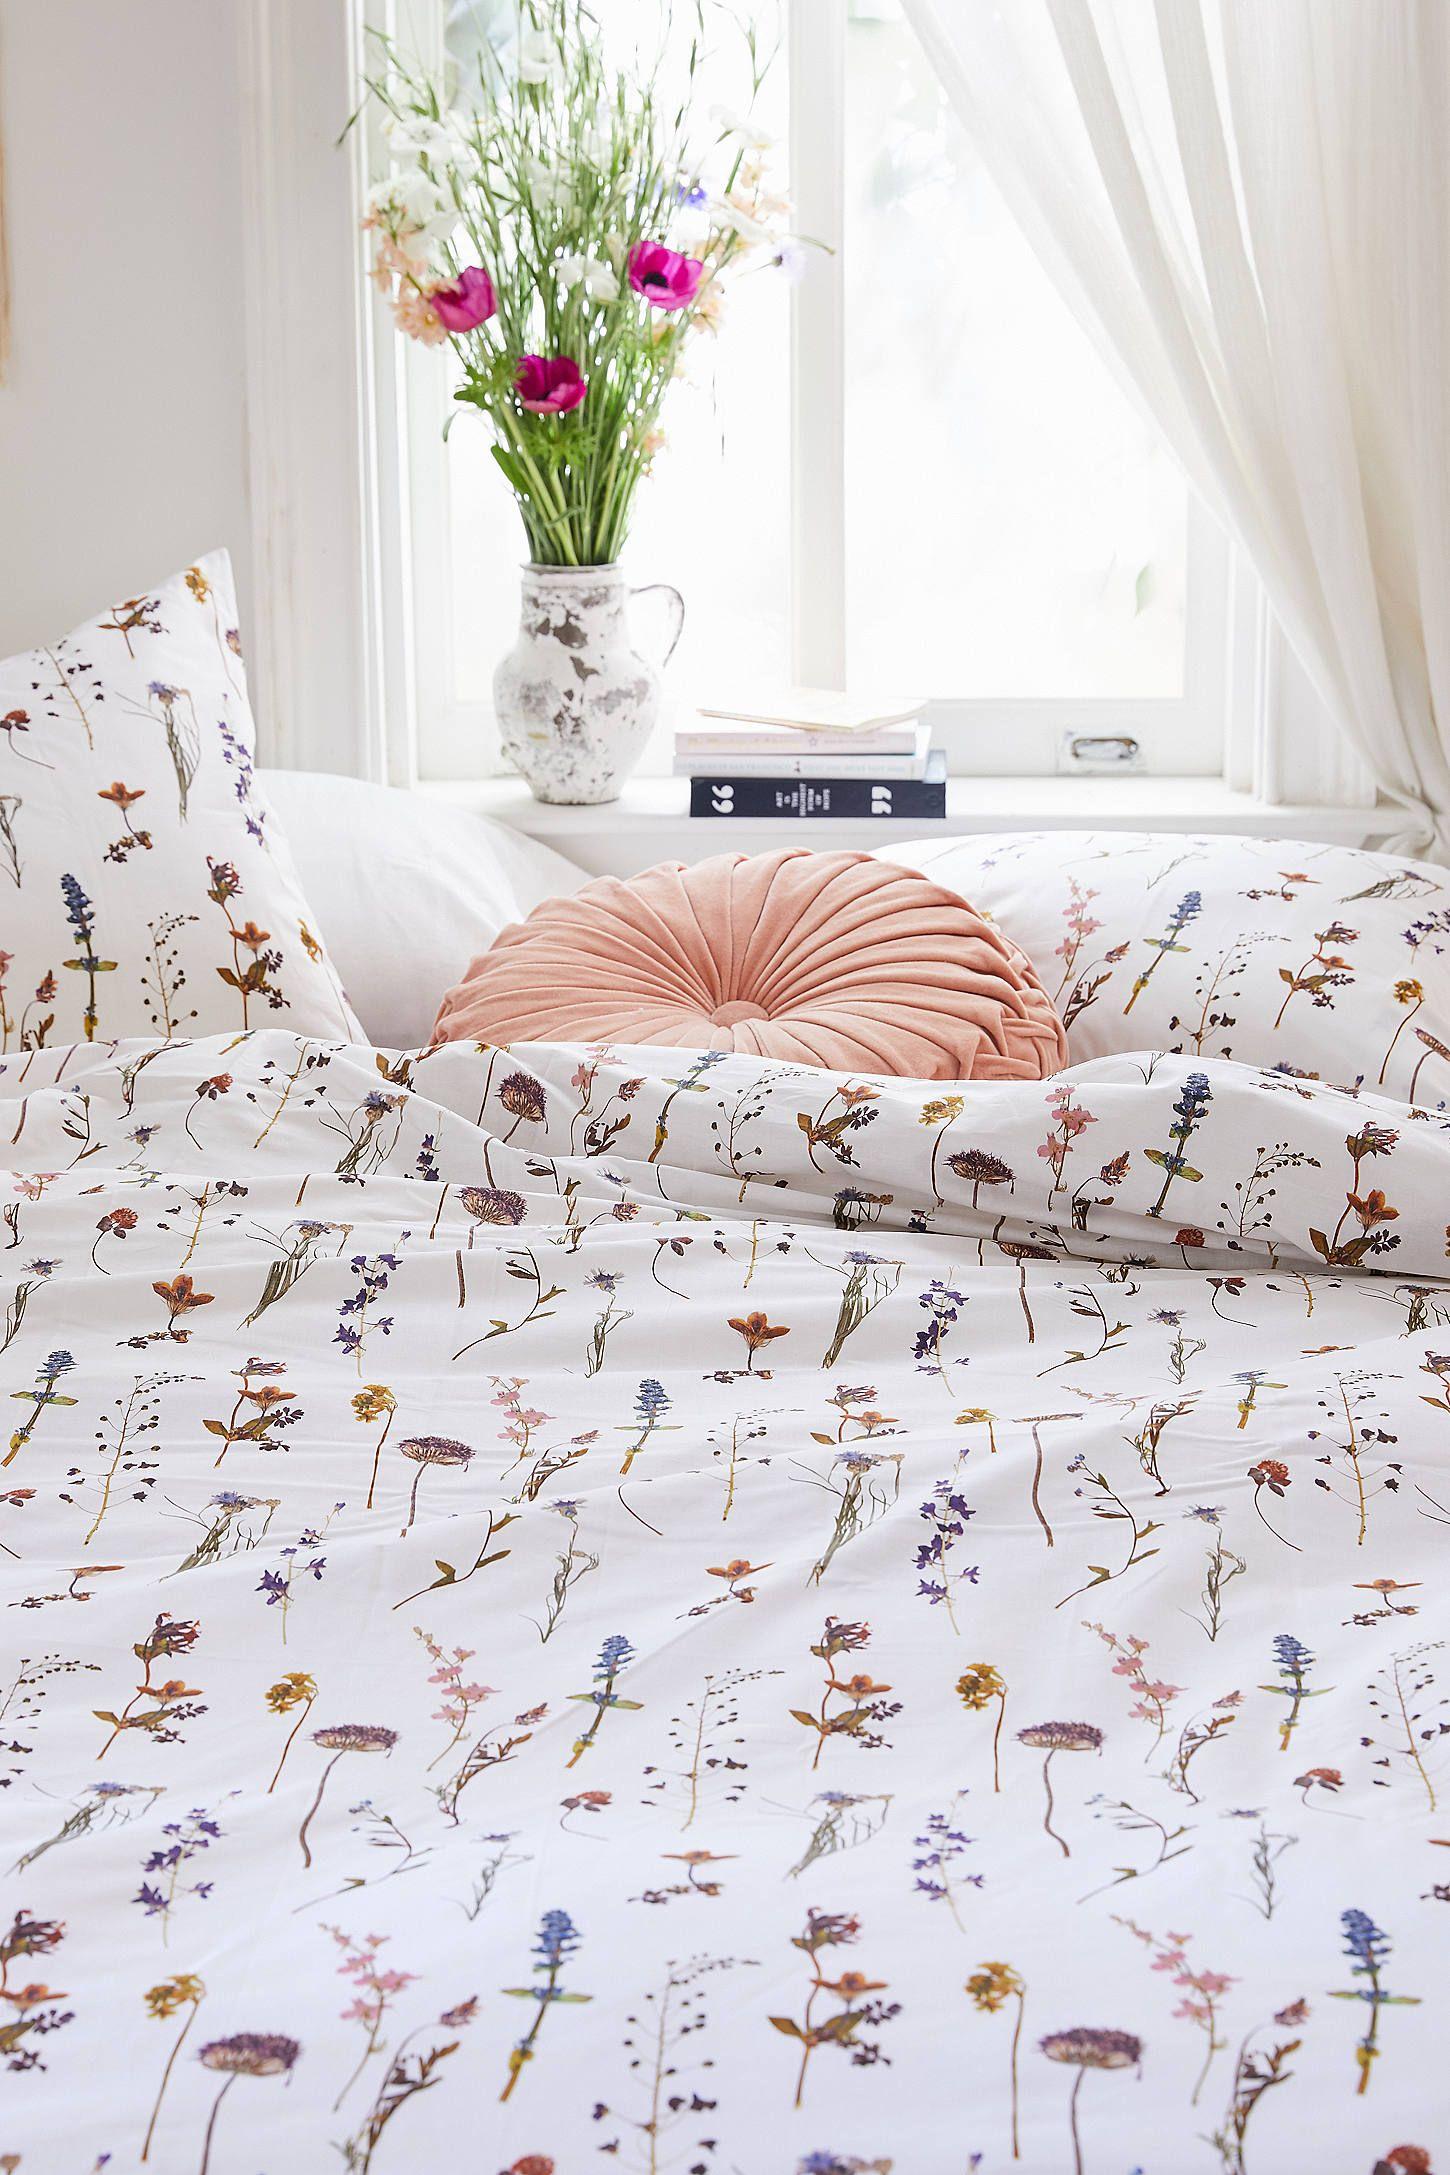 Ensemble Housse De Couette Fleurs Sechees In 2020 Spring Bedroom Duvet Cover Sets Spring Bedroom Decor